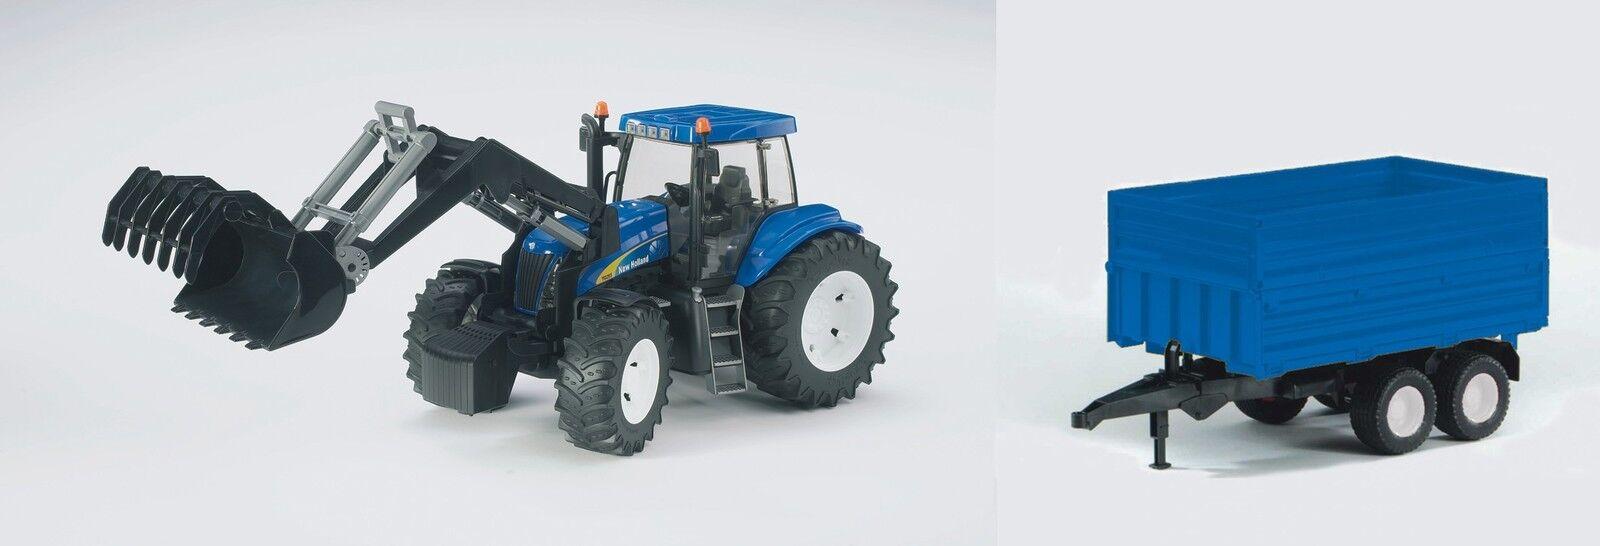 BRUDER®  01993 New Holland T8040 + Frontlader & Tandemachsanh. (blau), NEU & OVP